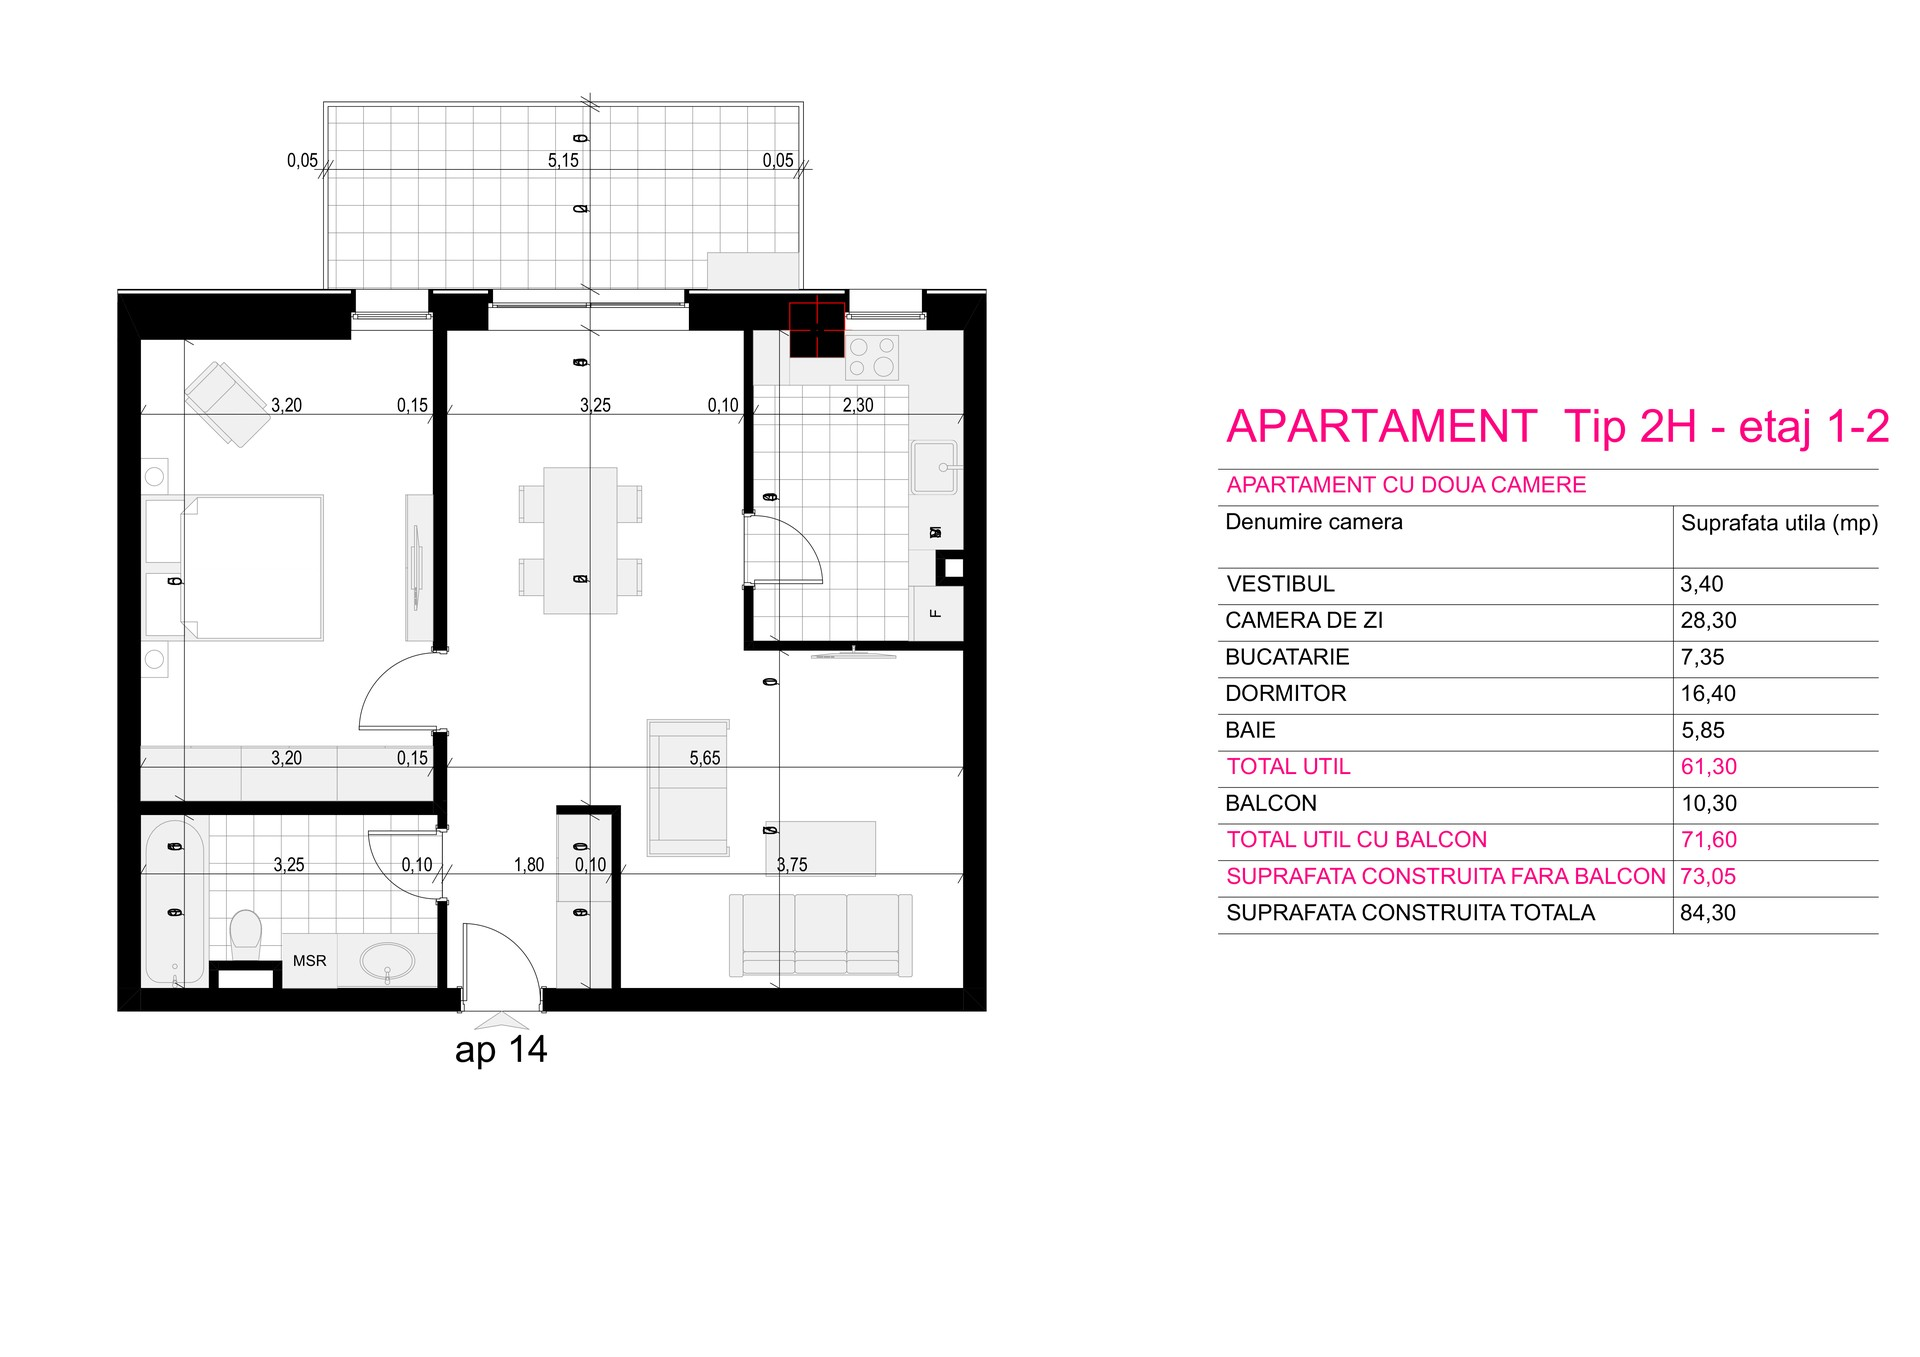 Ap Corp A Tip 2H etaj 1-2 - Aviatorii Residence